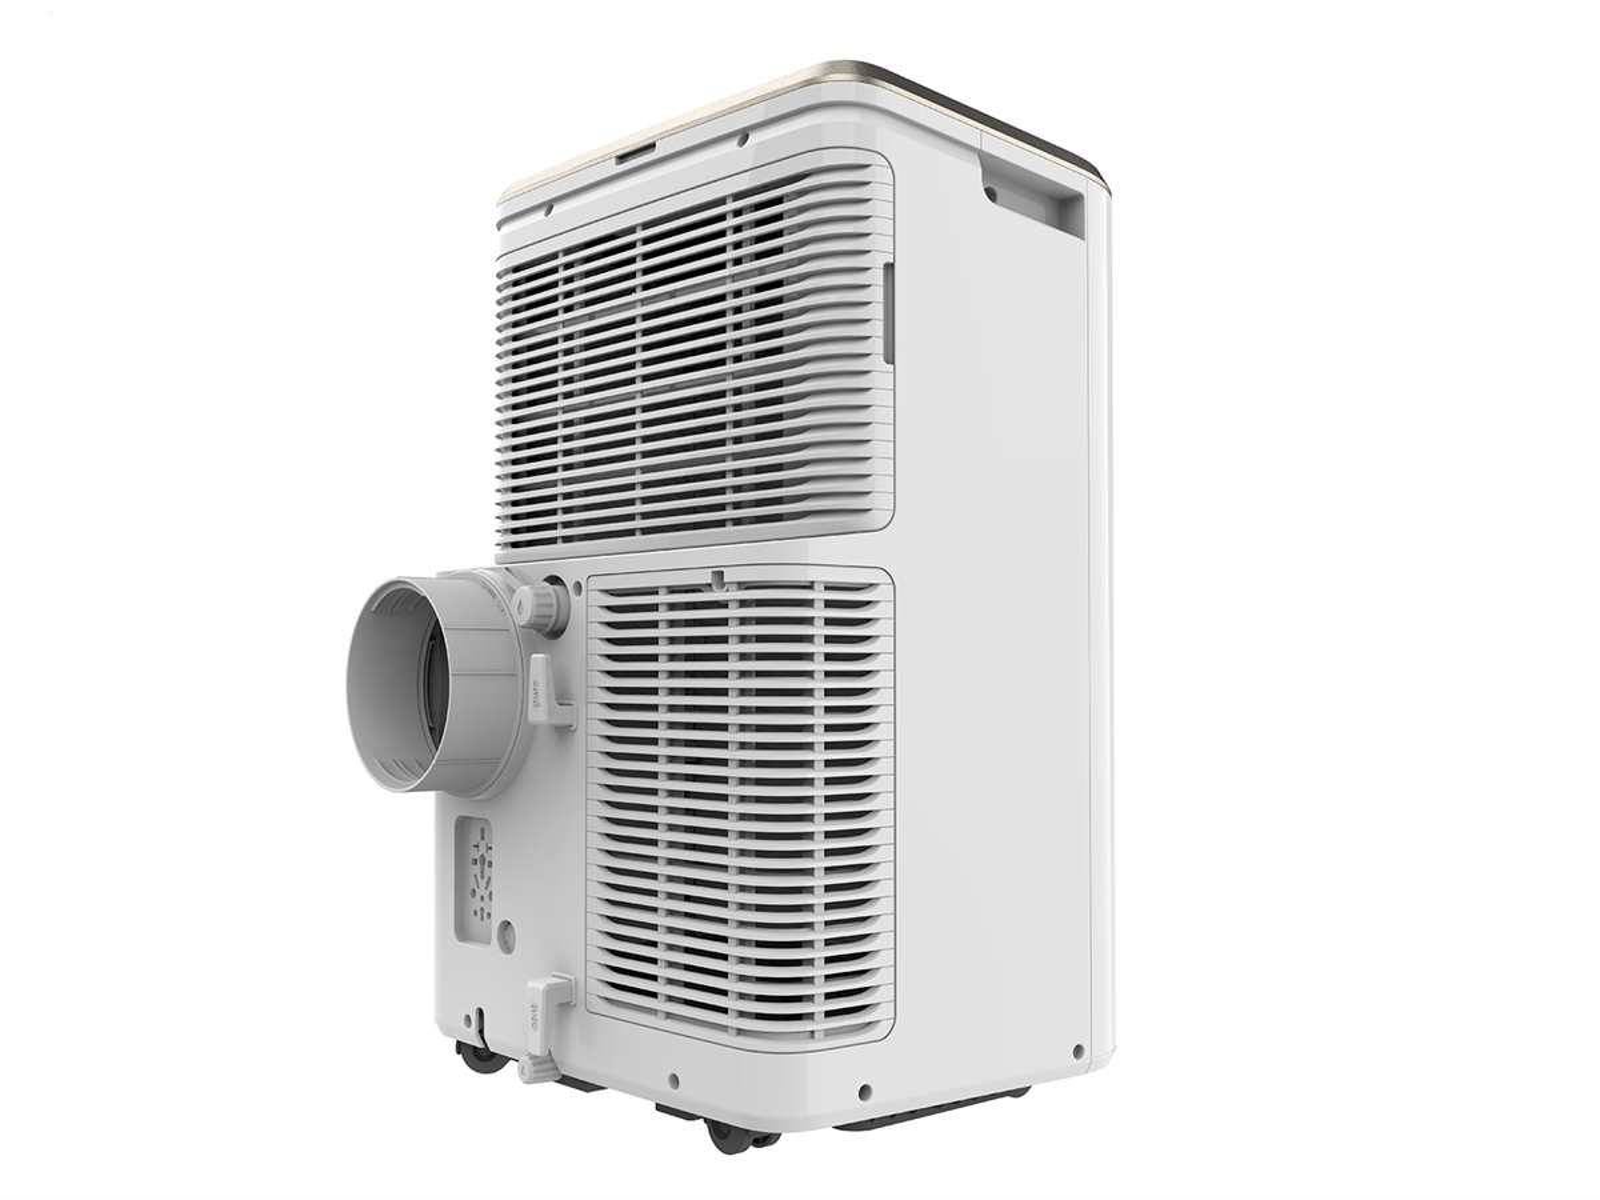 AEG Klimagerät AXP35U538CW ChillFlex Pro + Premium-Fenster-Kit AWK04